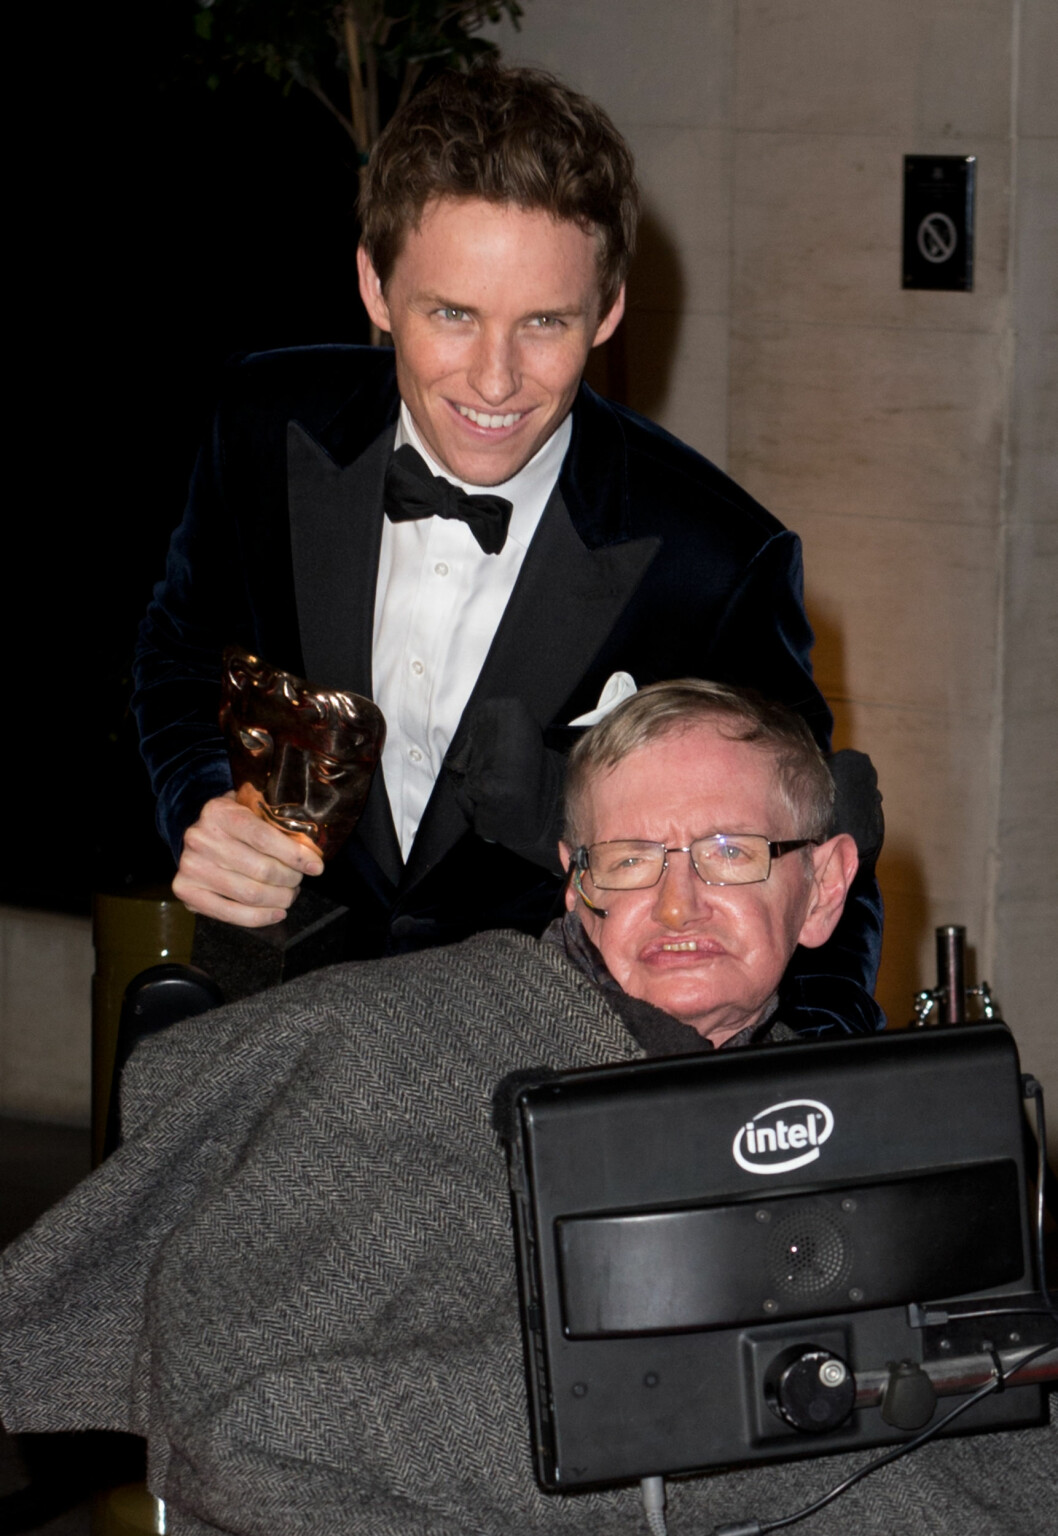 PRISVINNER: Eddie Redmayne sammen med ALS-rammede Stephen Hawking på BAFTA-utdelingen i London i februar. Redmaynes rolle som Hawking i «The Theory of Everything» sikret ham også en Oscar og en Golden Globe. Foto: Splash News/ All Over Press